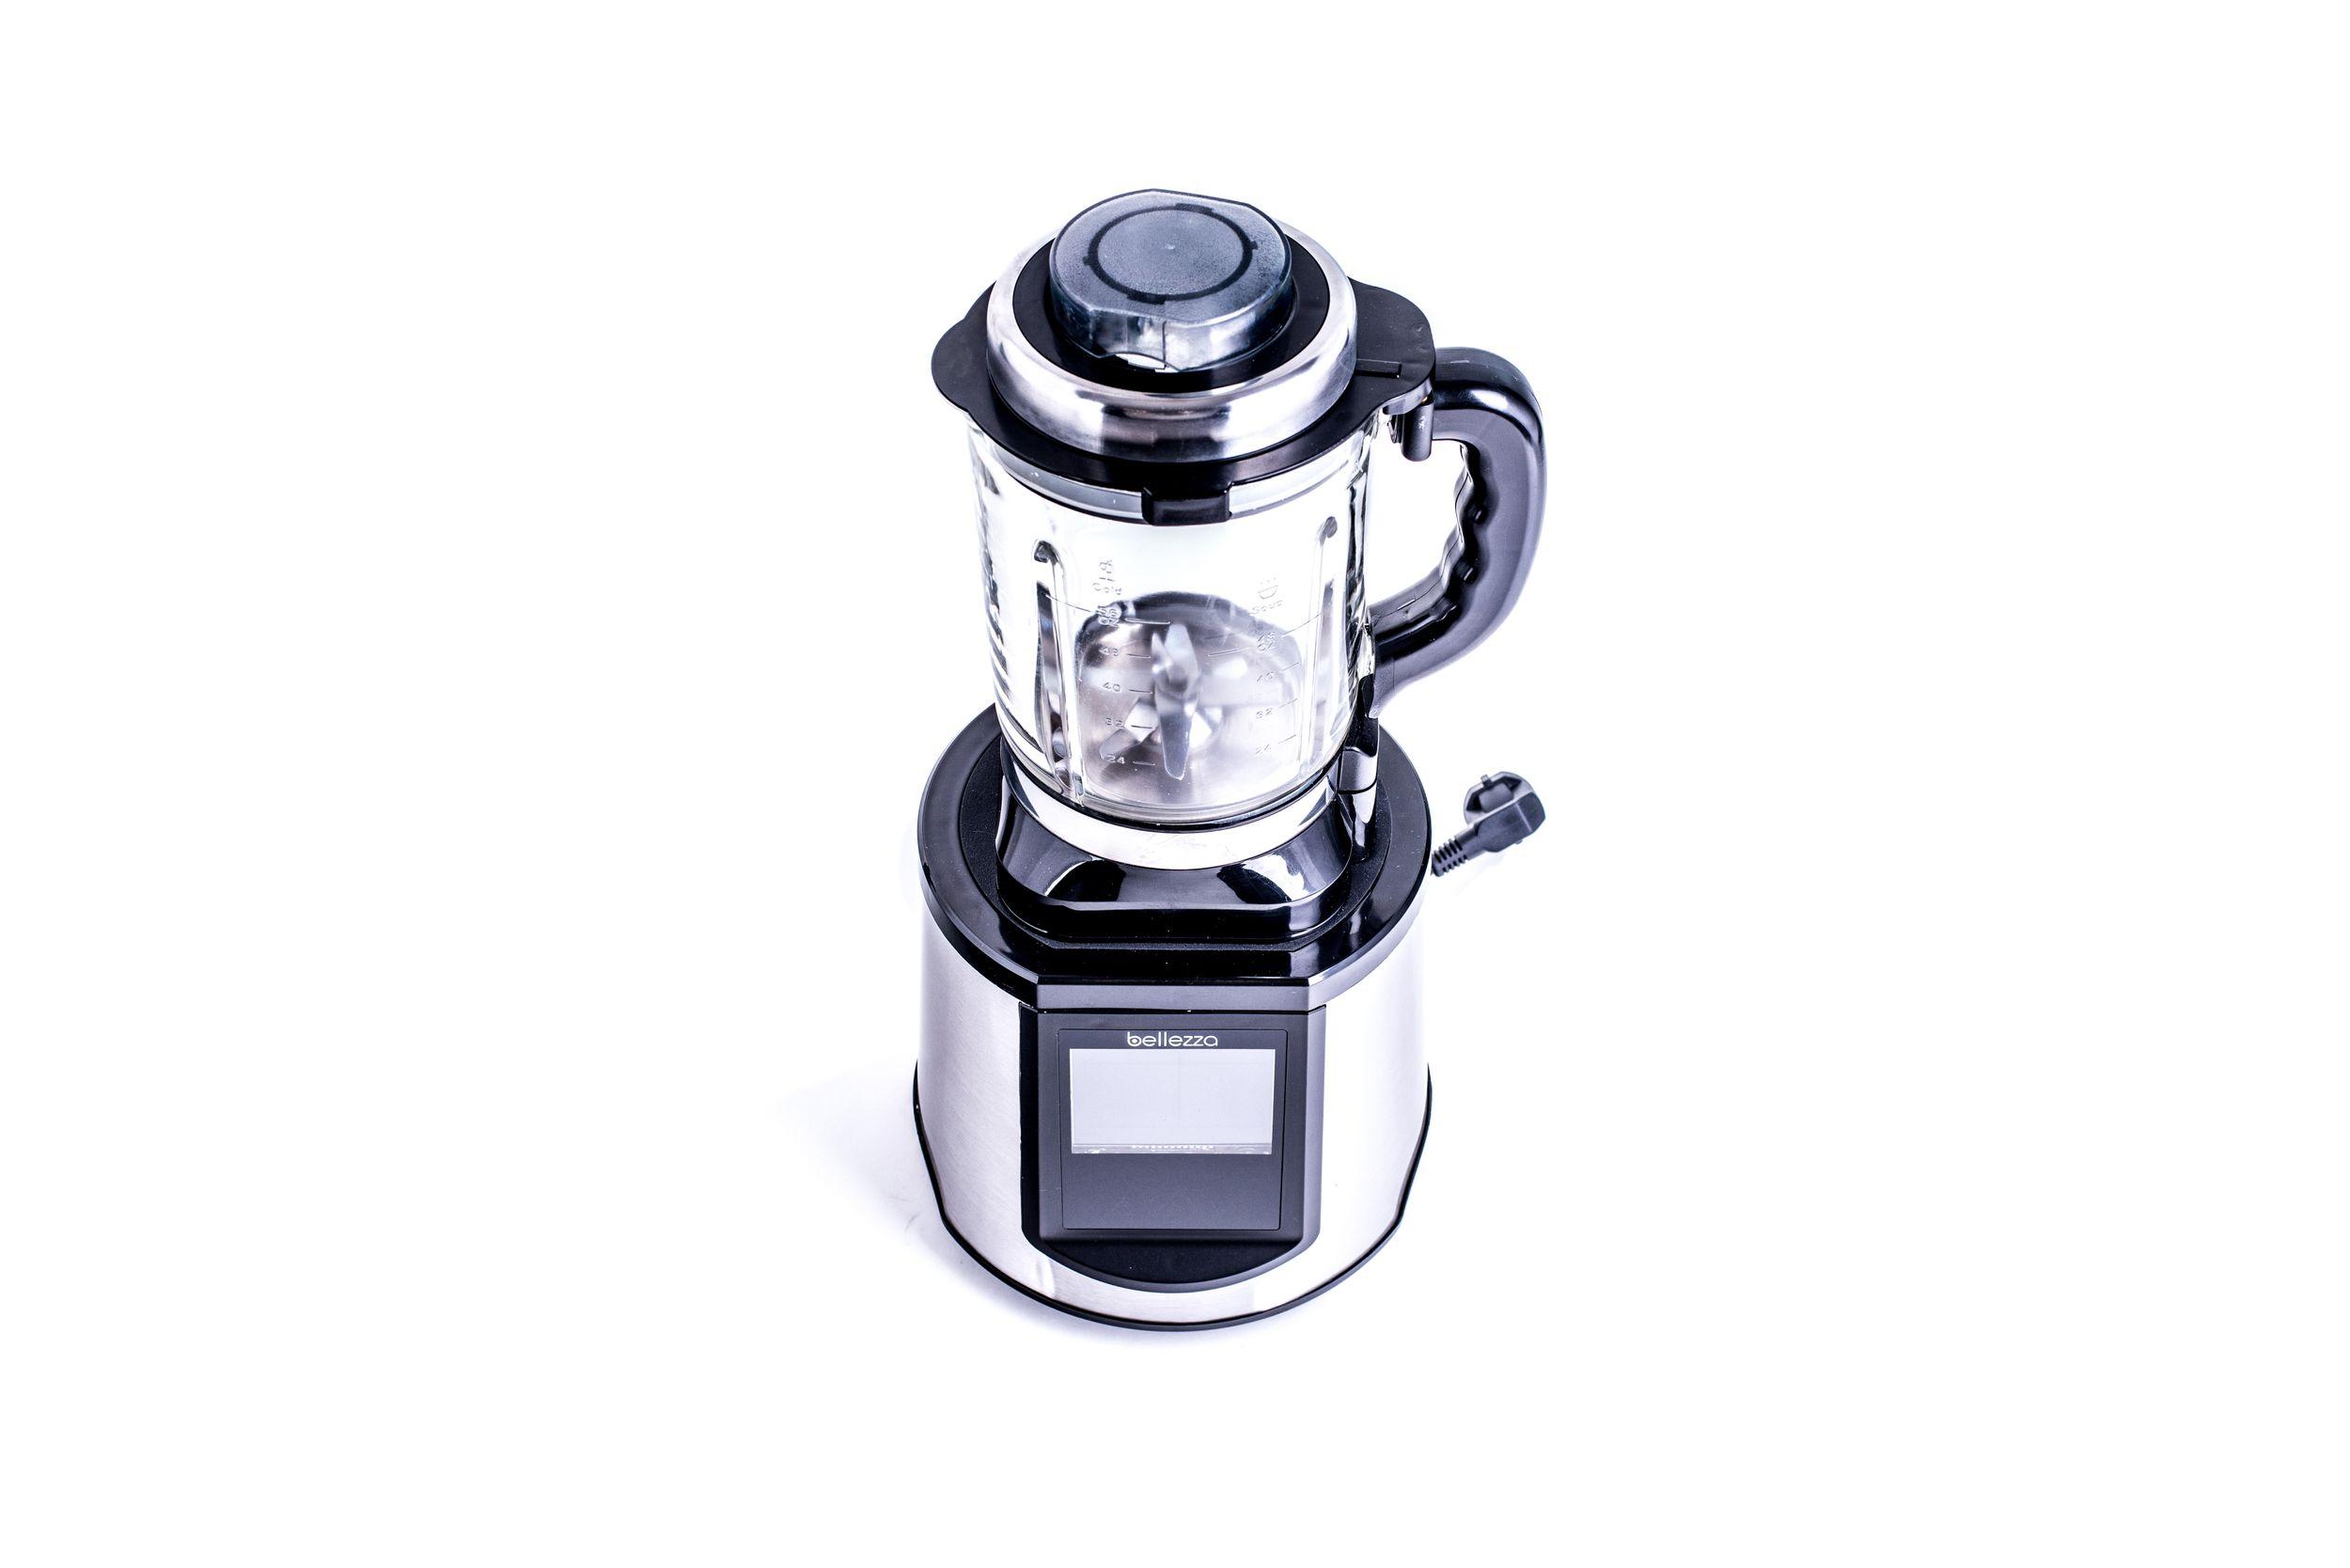 Profistandmixer Kochfunktion Glaskrug Powermixer Blender Cocktailmixer 1,5L *FEHLPRODUKTION*71563 Bild 2